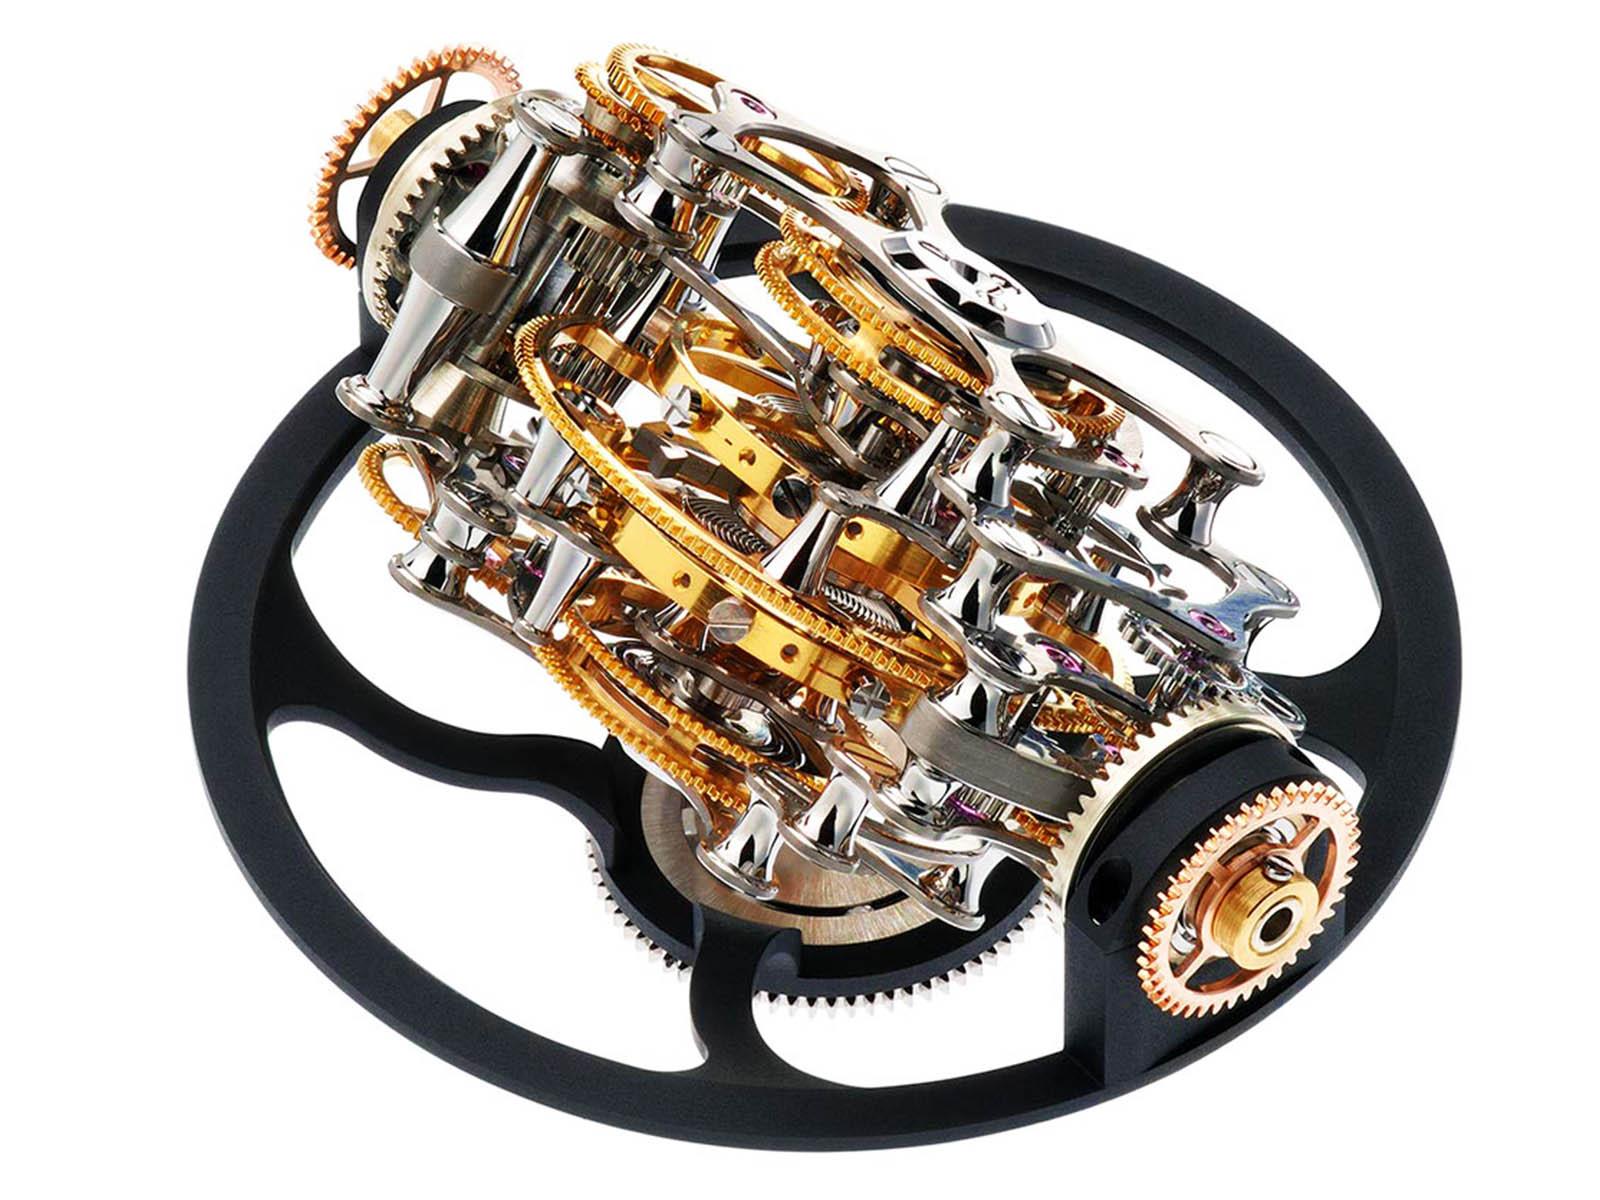 vianney-halter-deep-space-resonance-prototype-6.jpg